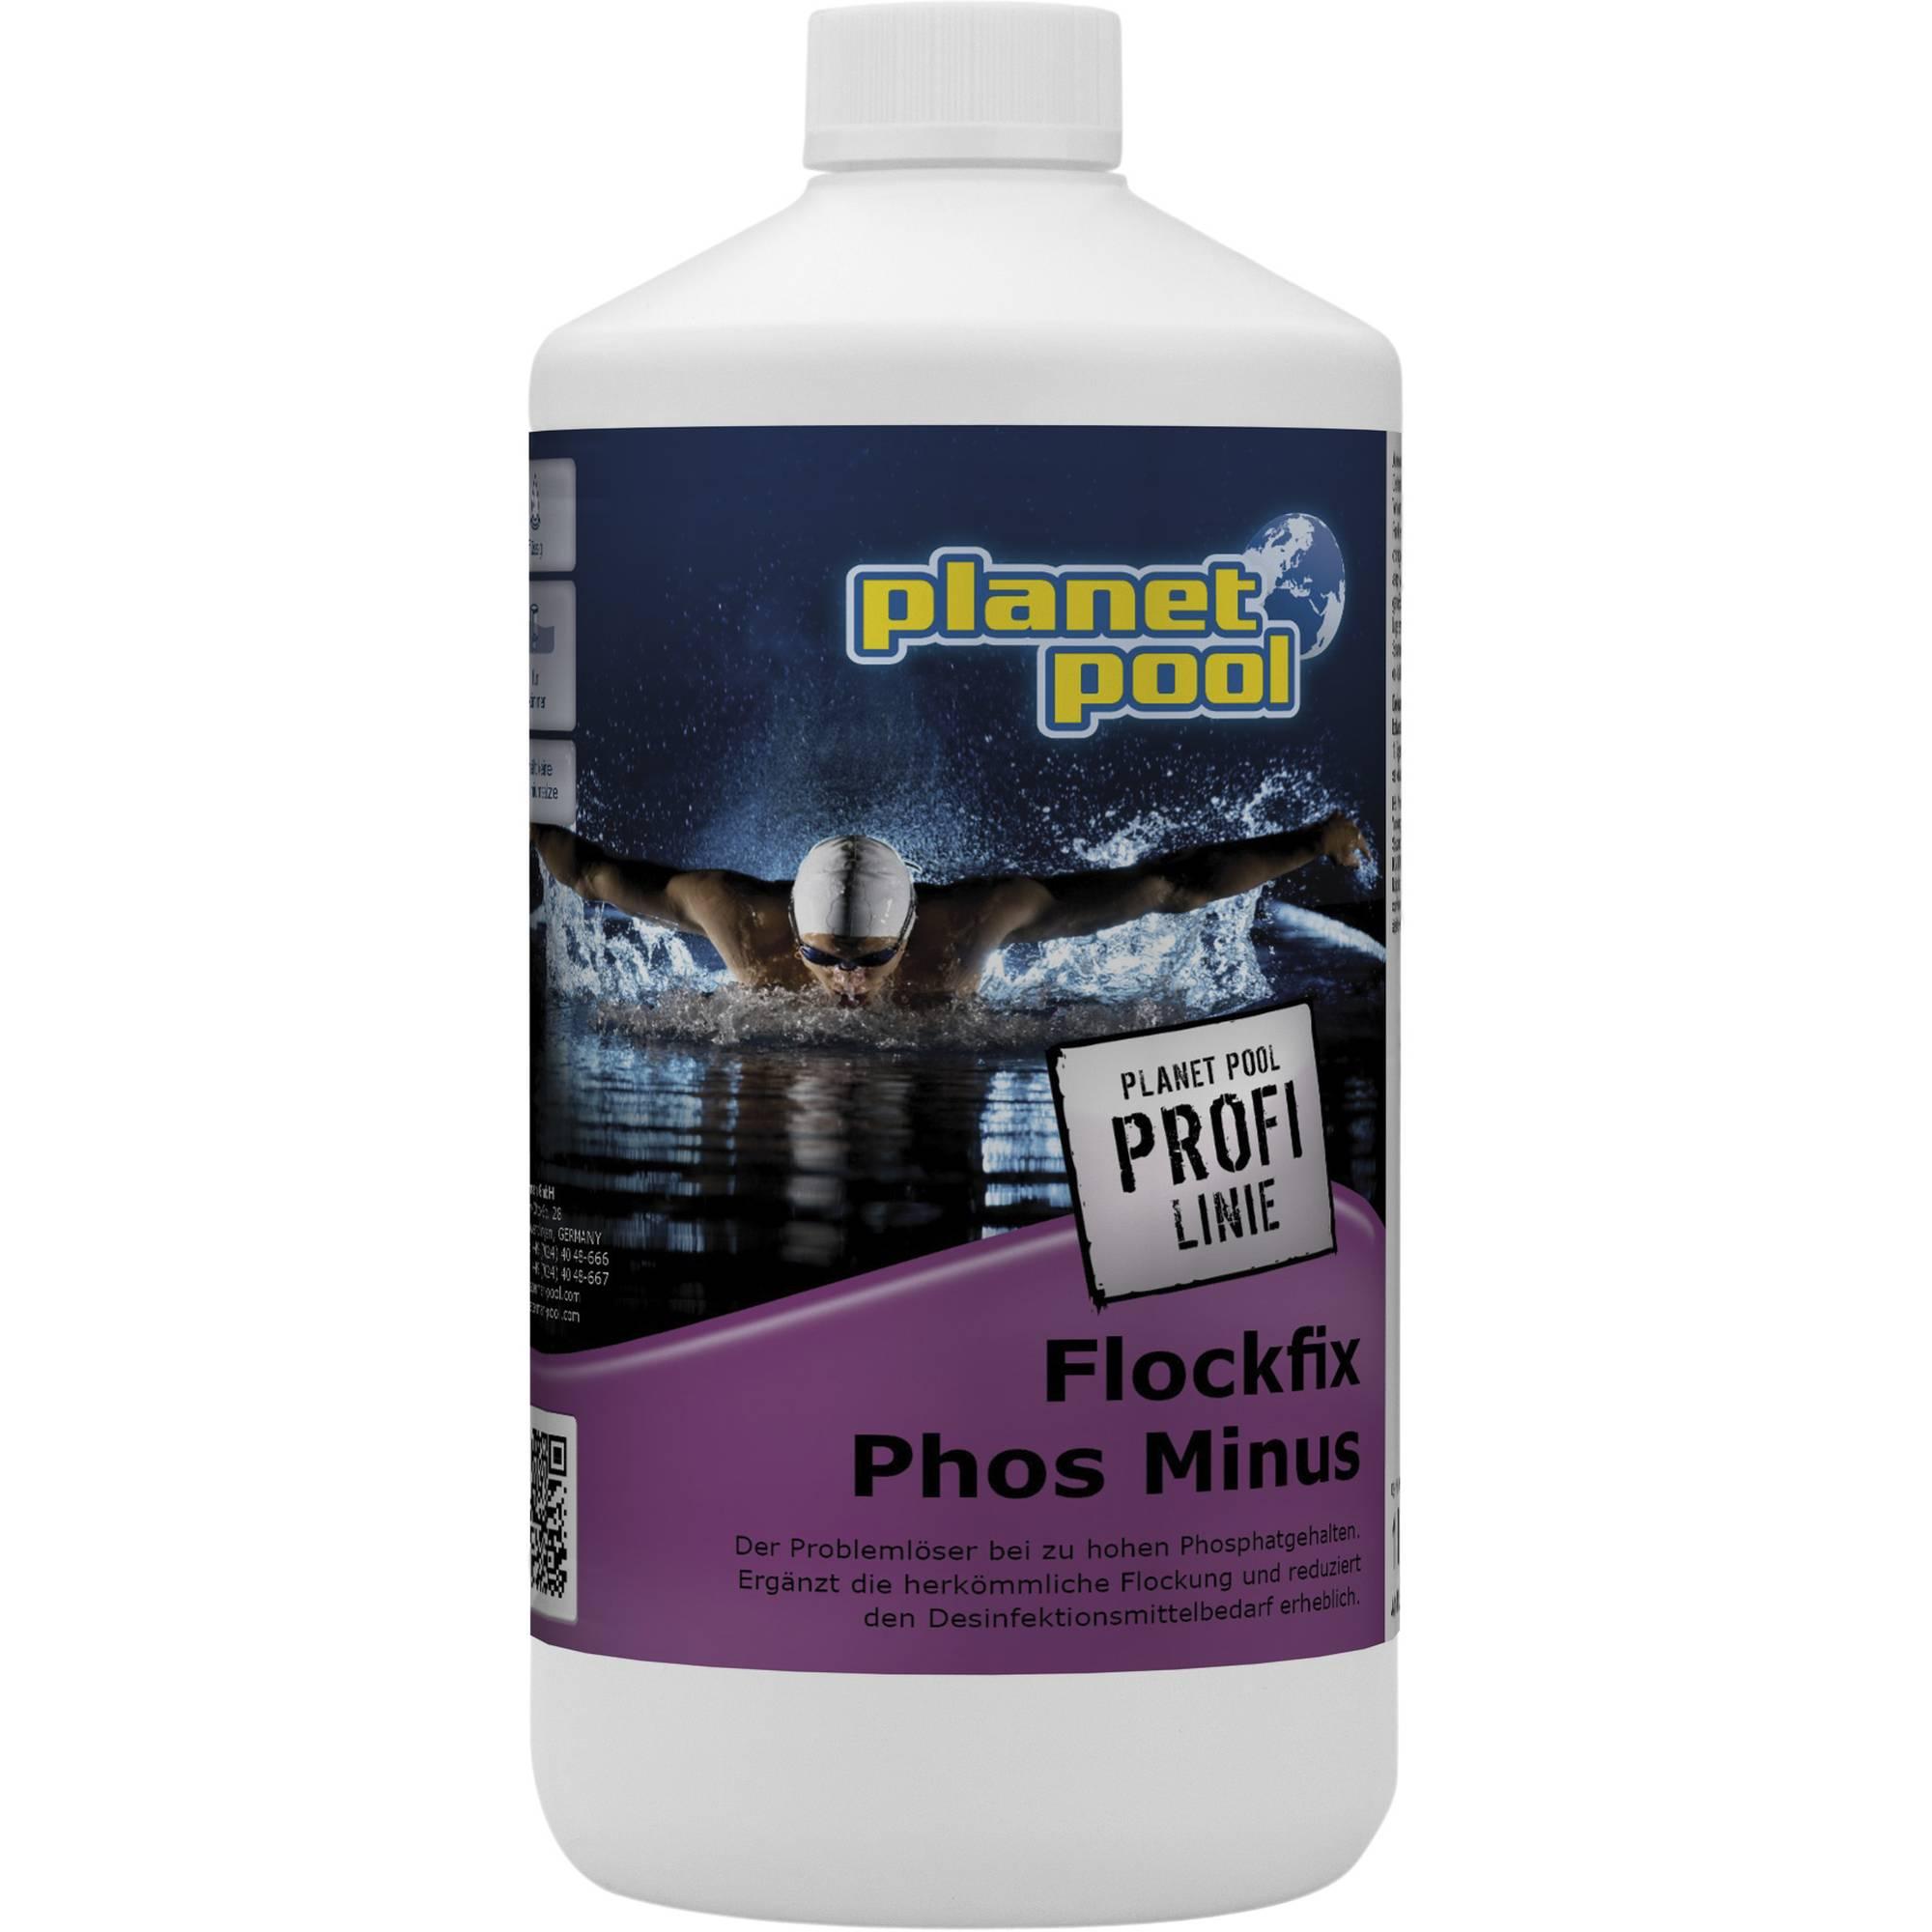 PLANET POOL - Profi Linie   Flockfix Phos Minus 1 Liter